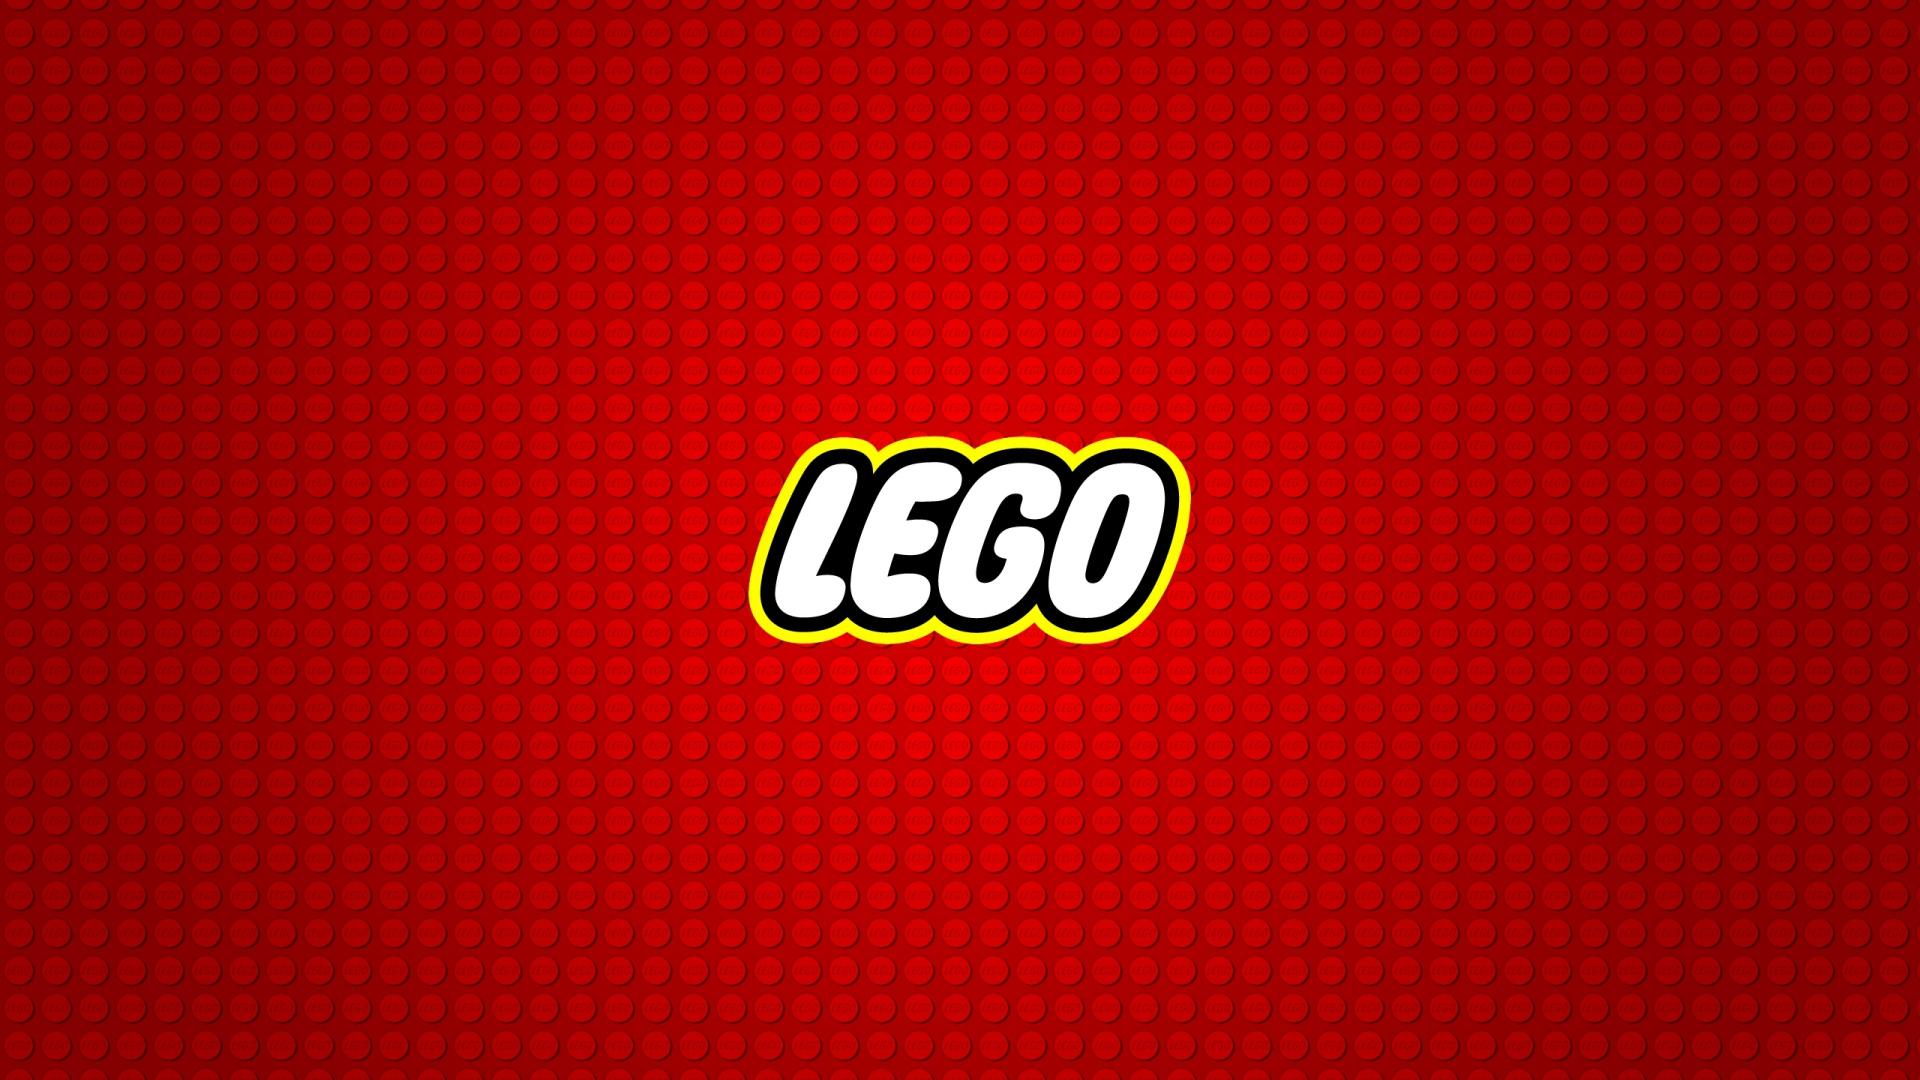 Dapatkan kode voucher lego Indonesia untuk mendapatkan diskon ekstra! Cek promo kuponnya di DiskonAja